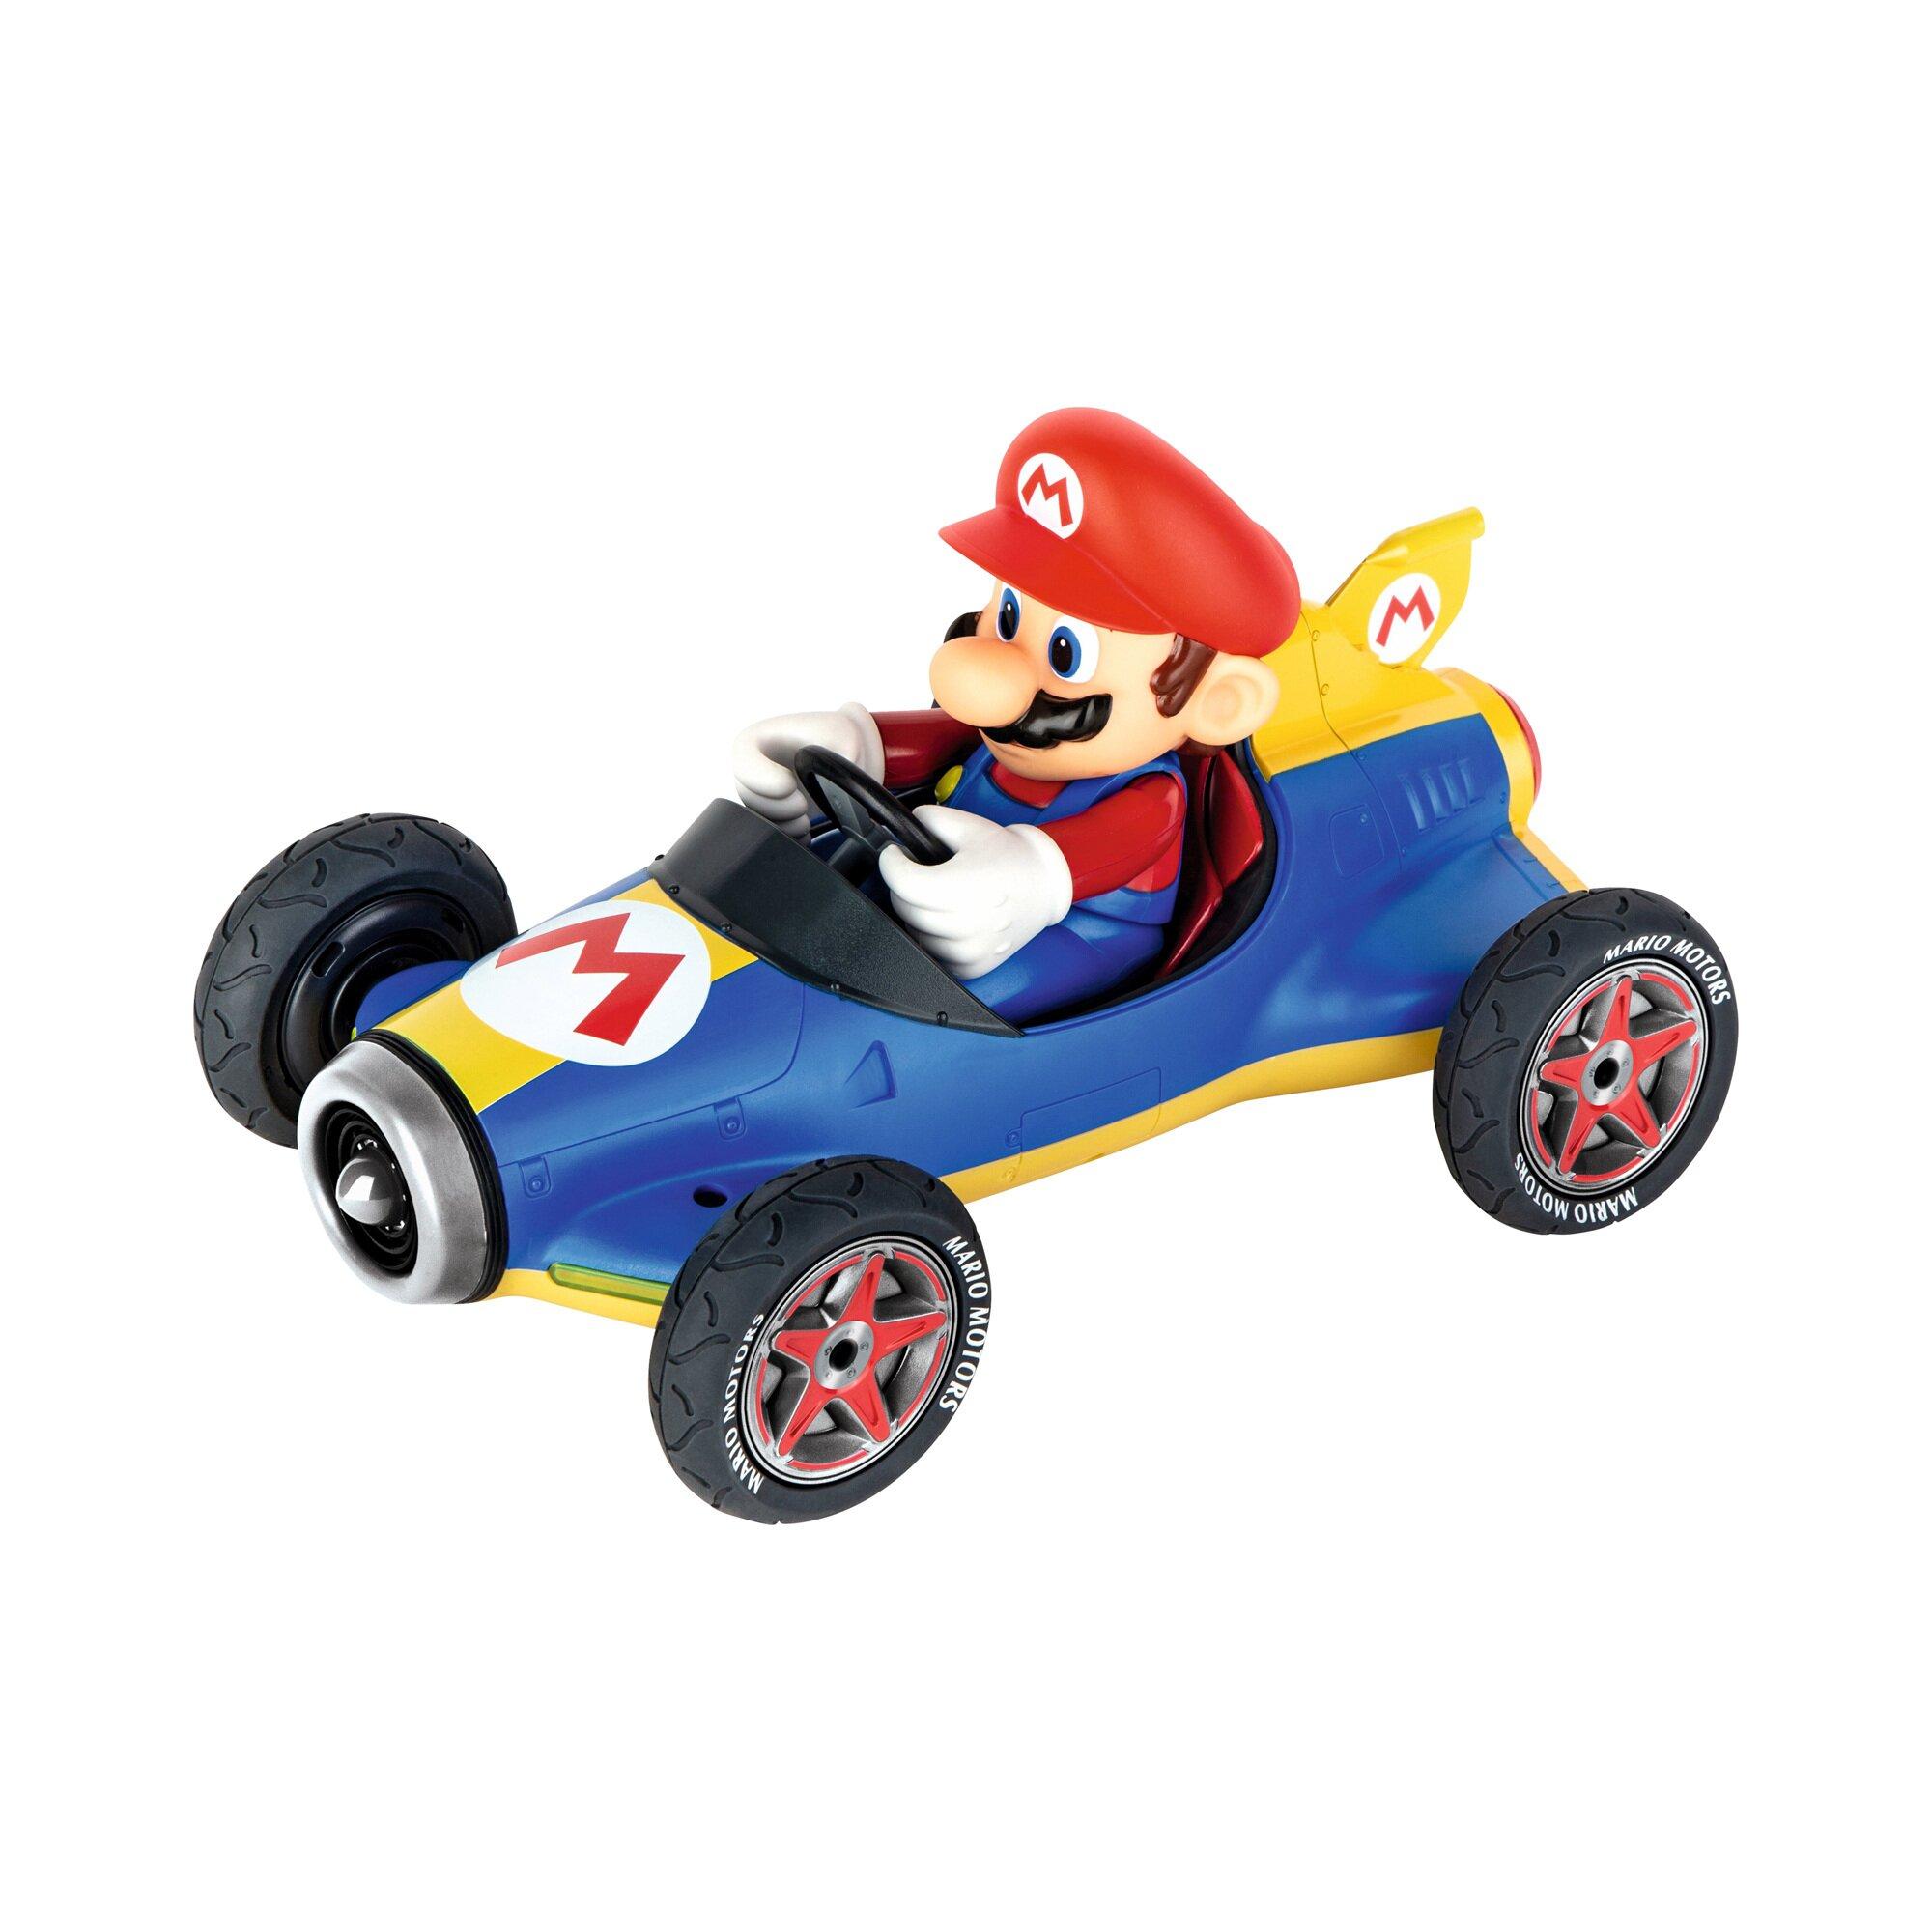 Mario Kart RC-Auto Nintendo Mario Kart™ Mach 8, Mario